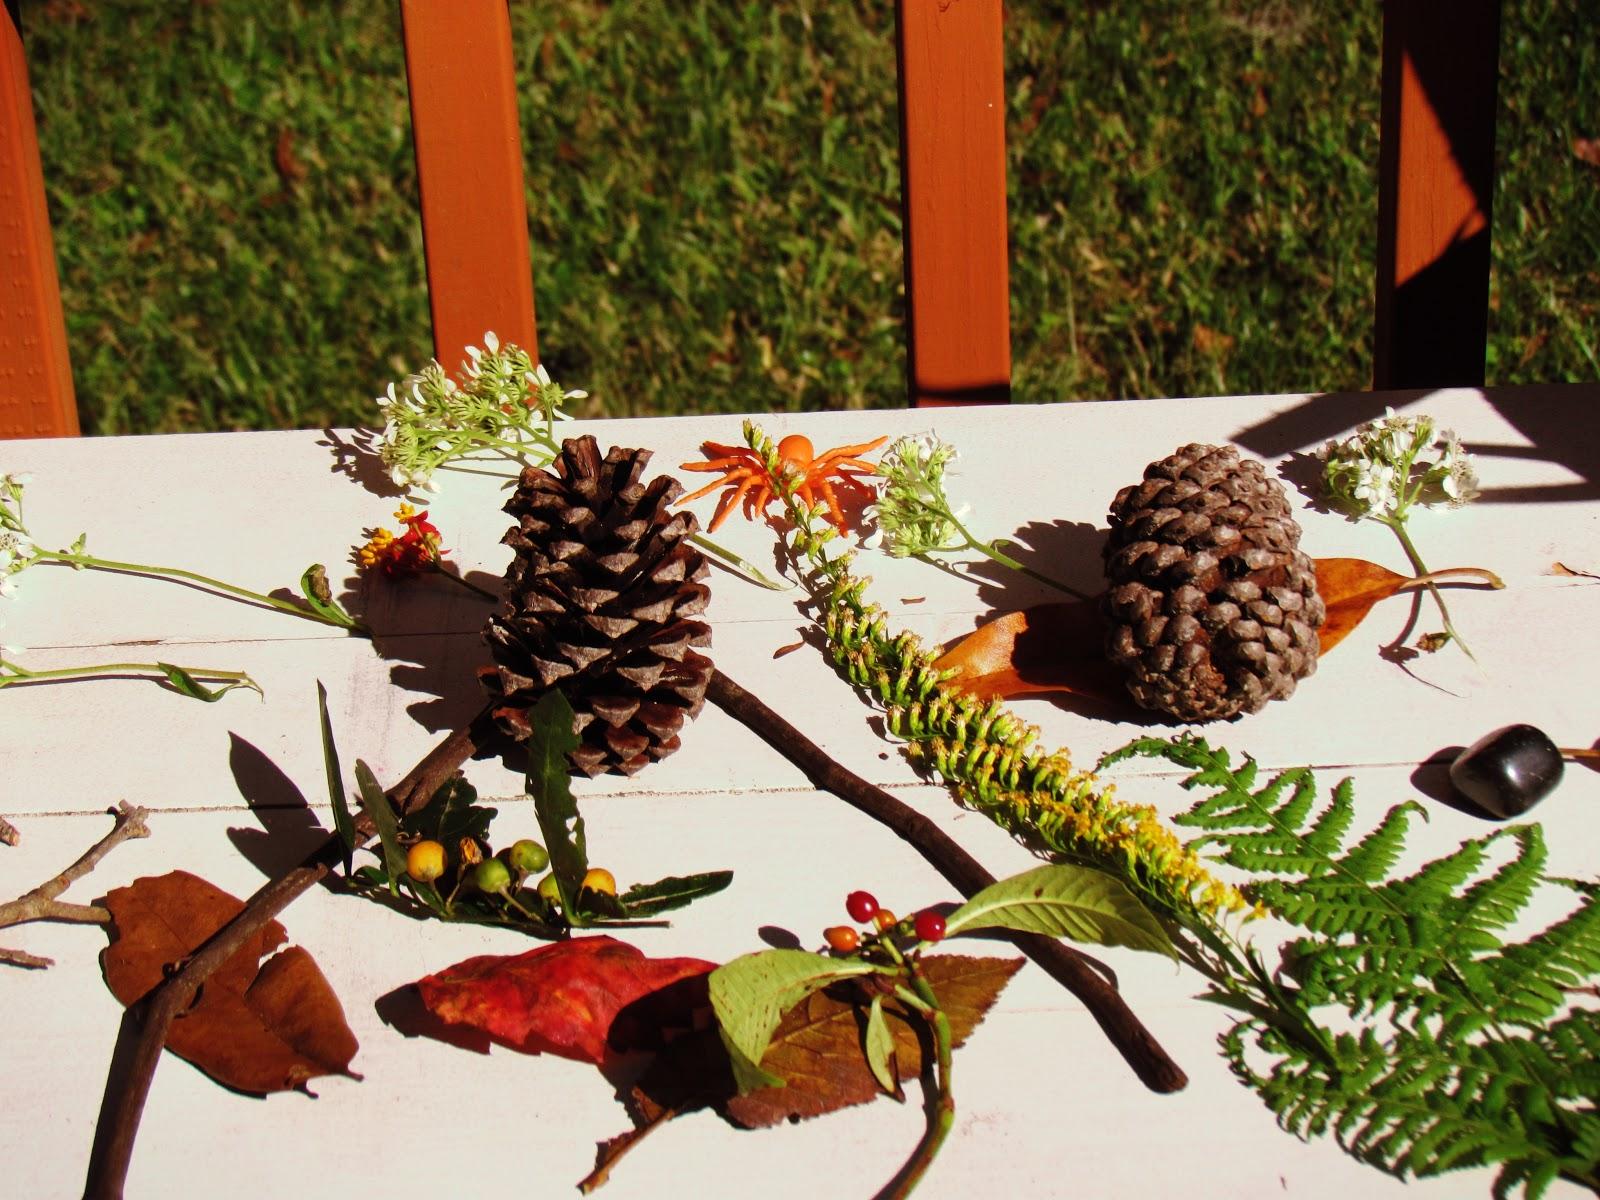 Nature Art Flat Lay Materials With Botanicals